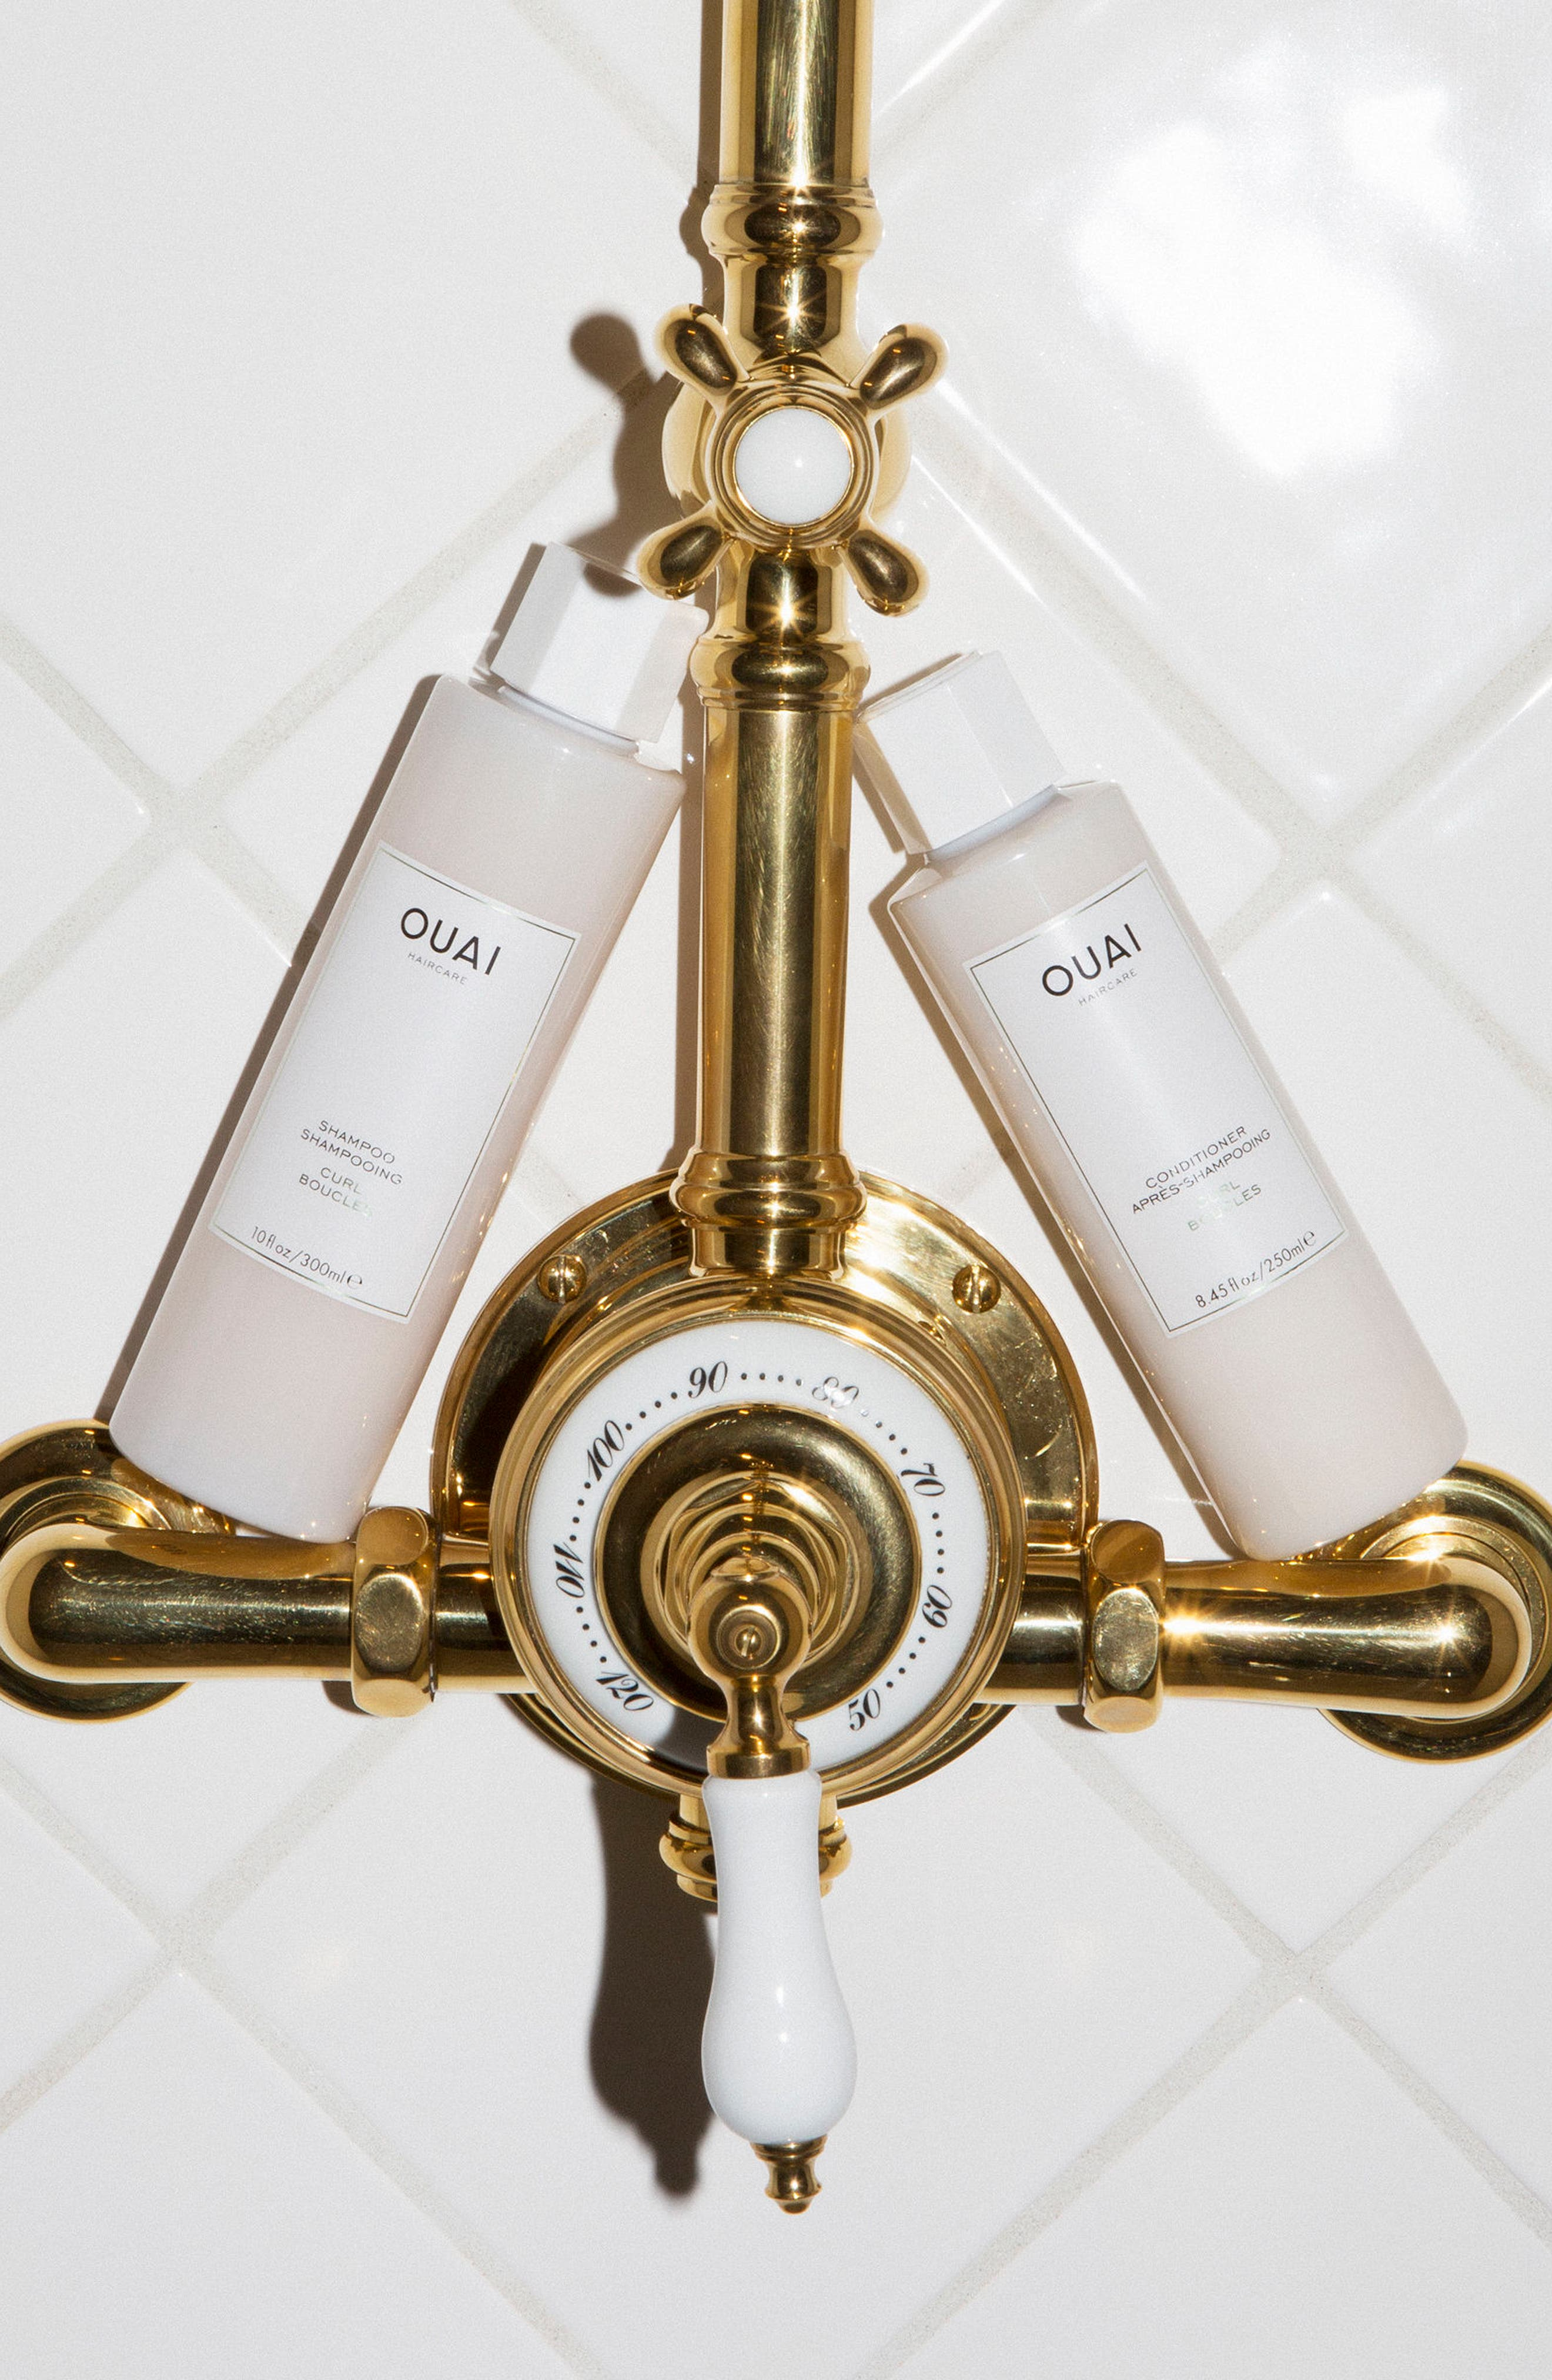 OUAI,                             Curl Shampoo,                             Alternate thumbnail 2, color,                             NO COLOR